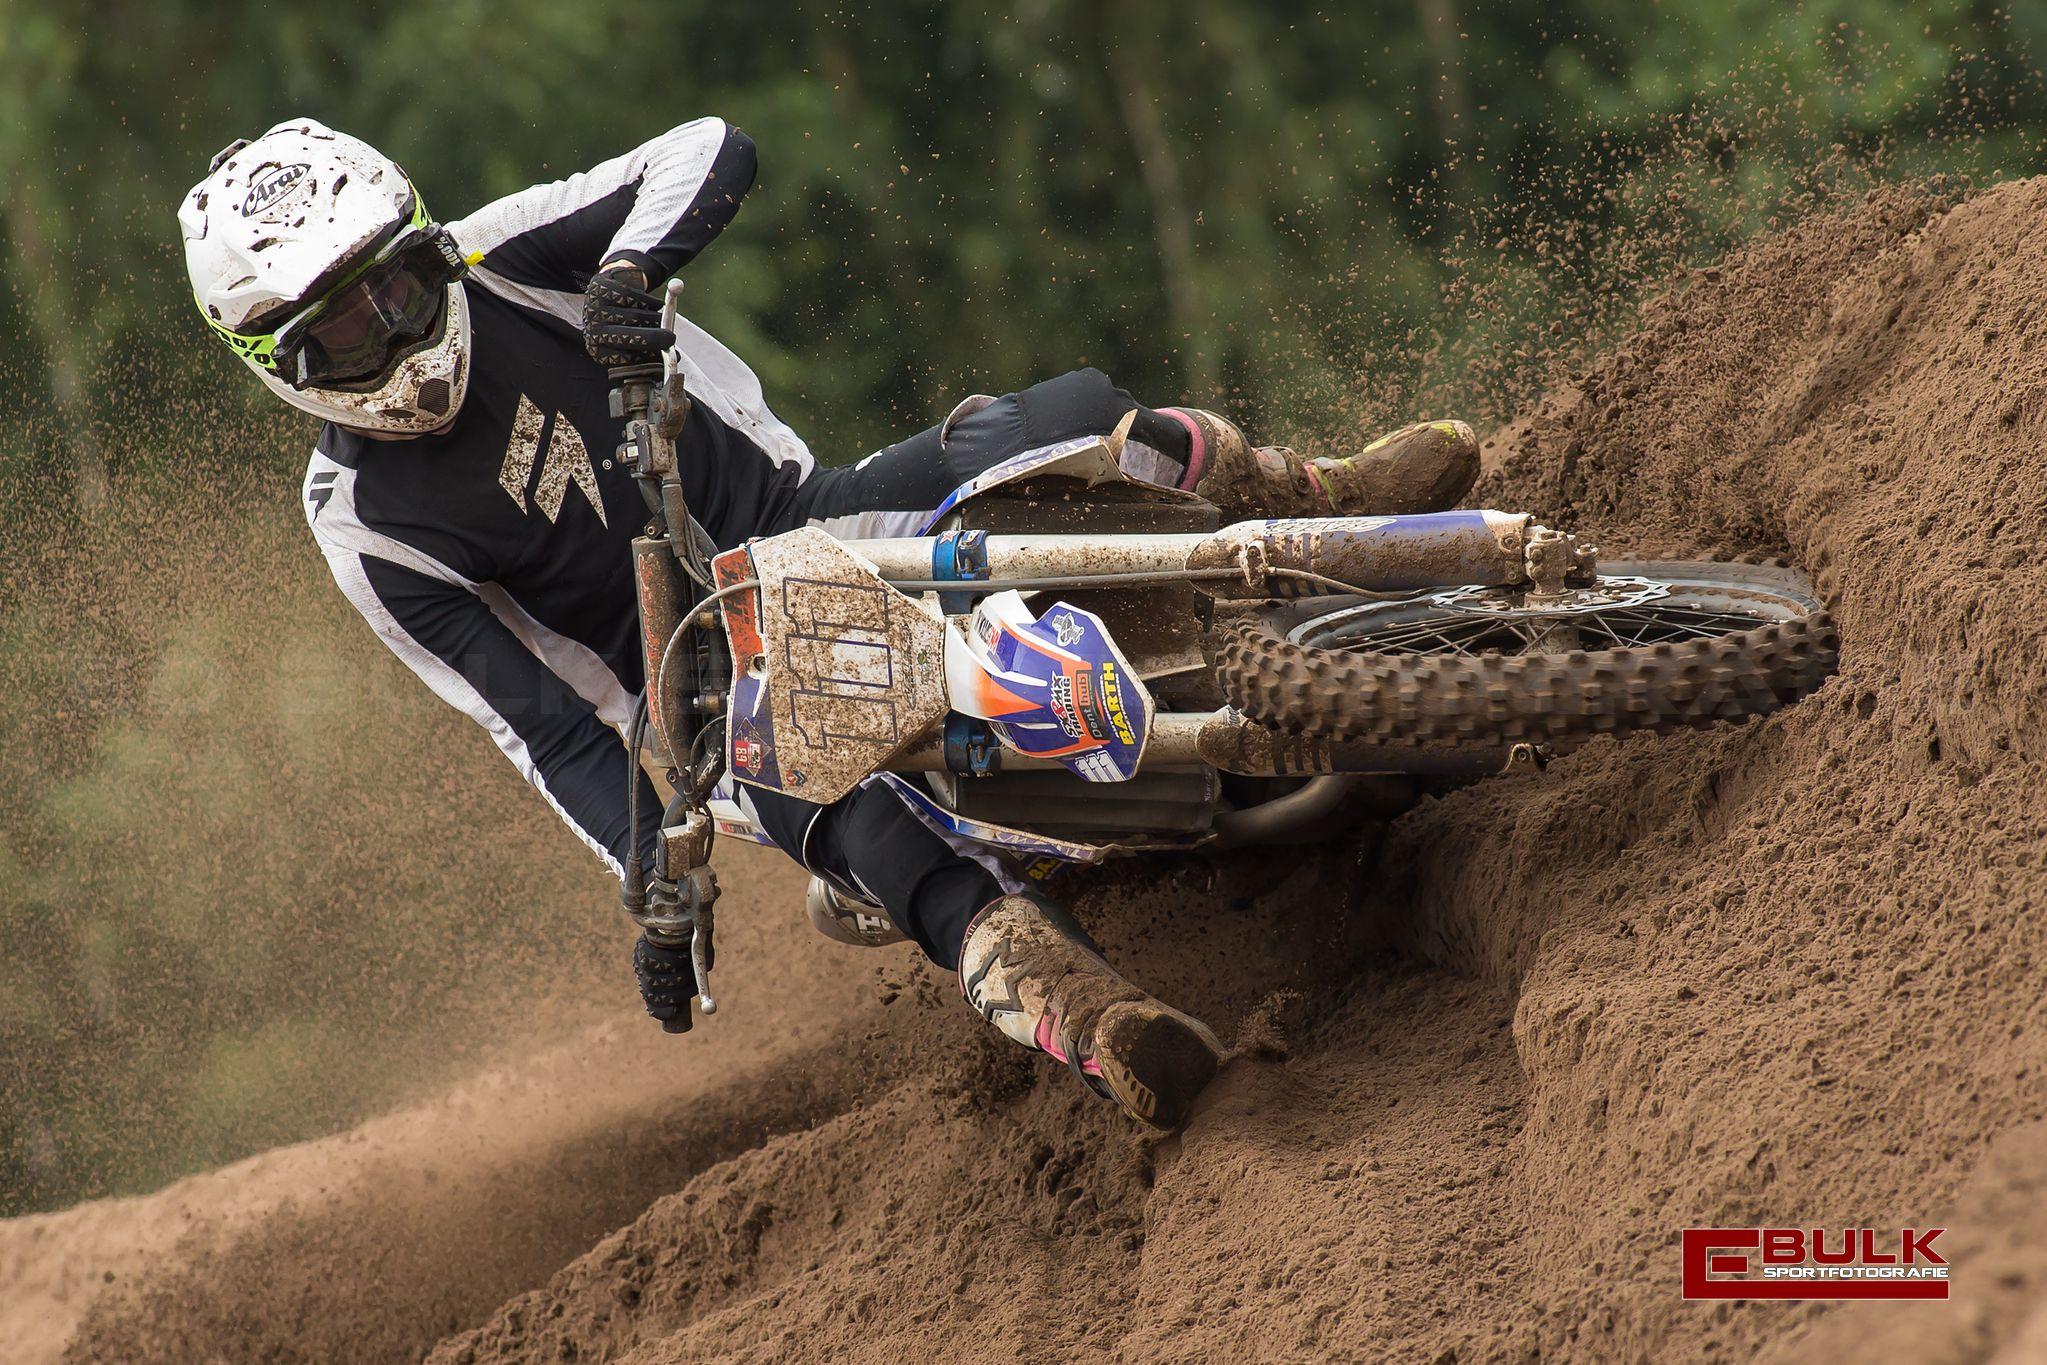 eebs0733-ed_bulk_sportfotografie